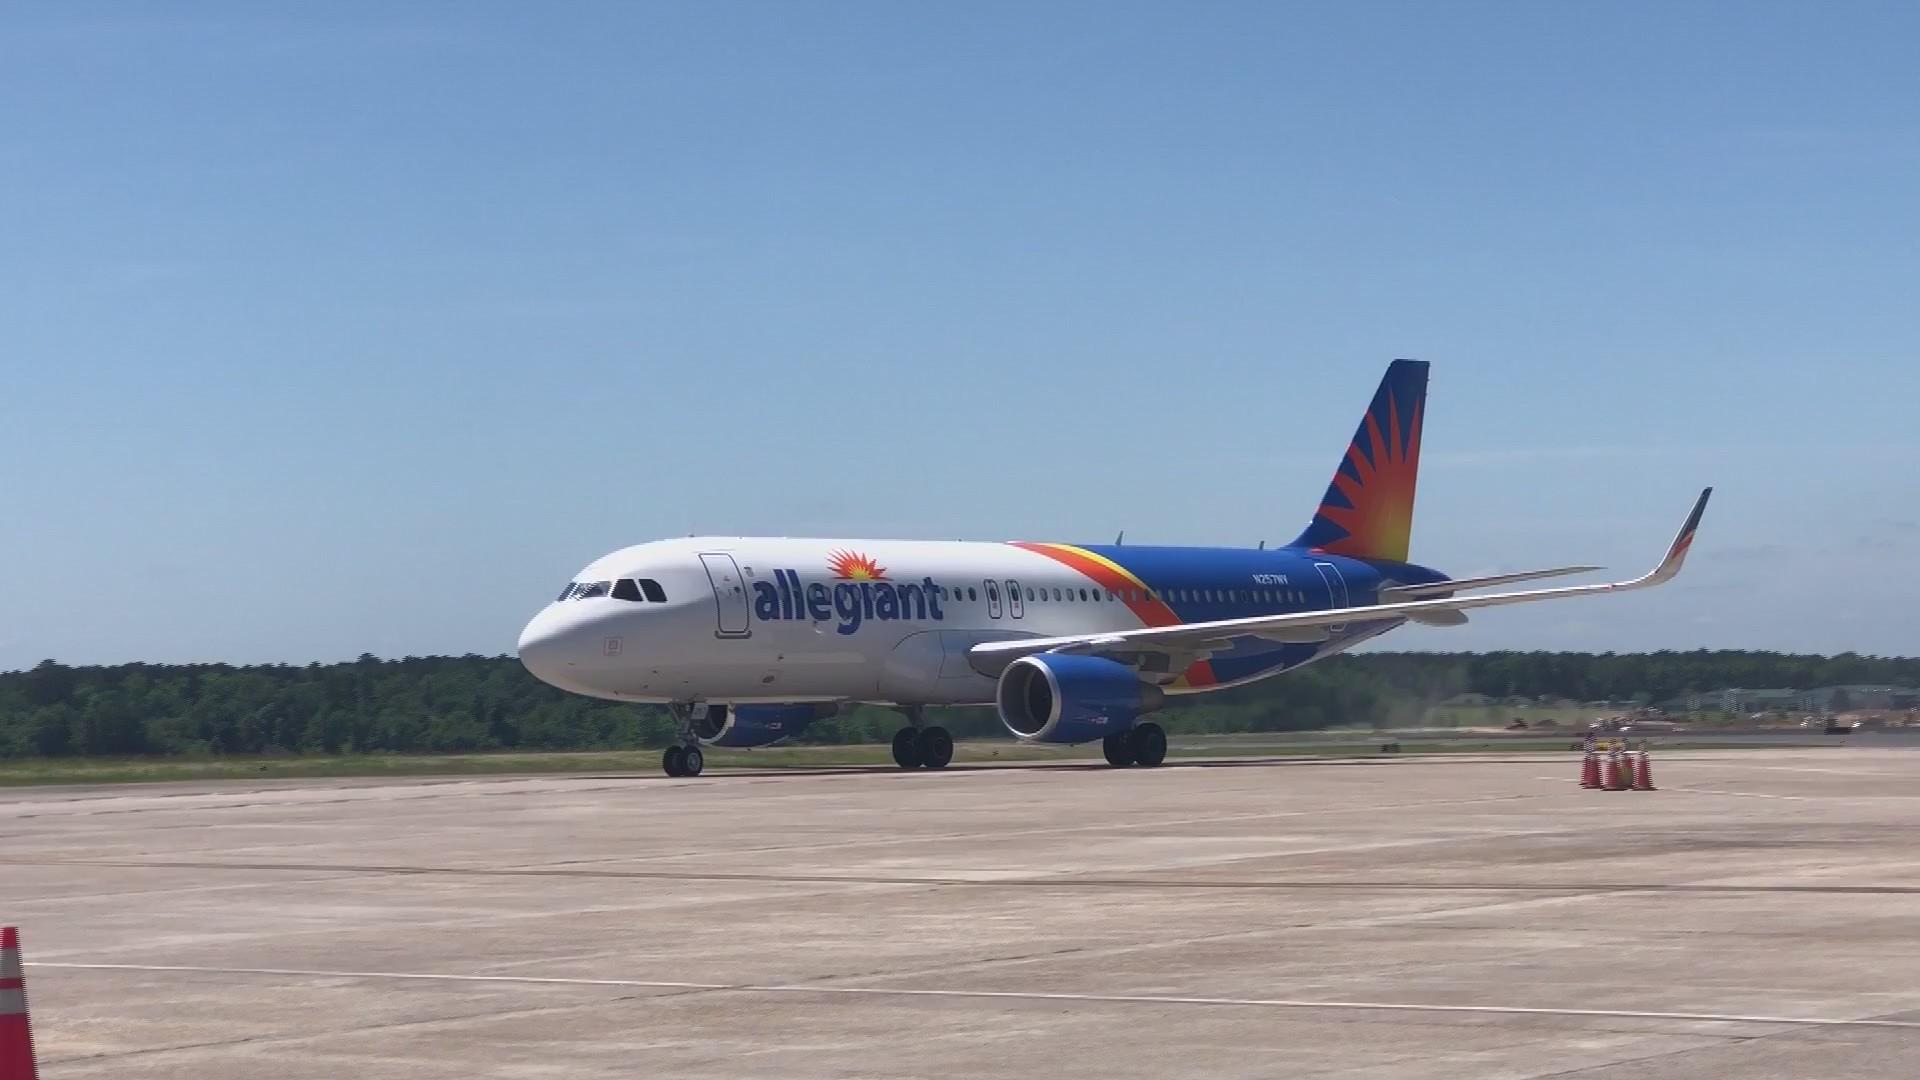 Allegiant launches non-stop service to Destin, FL from Shreveport